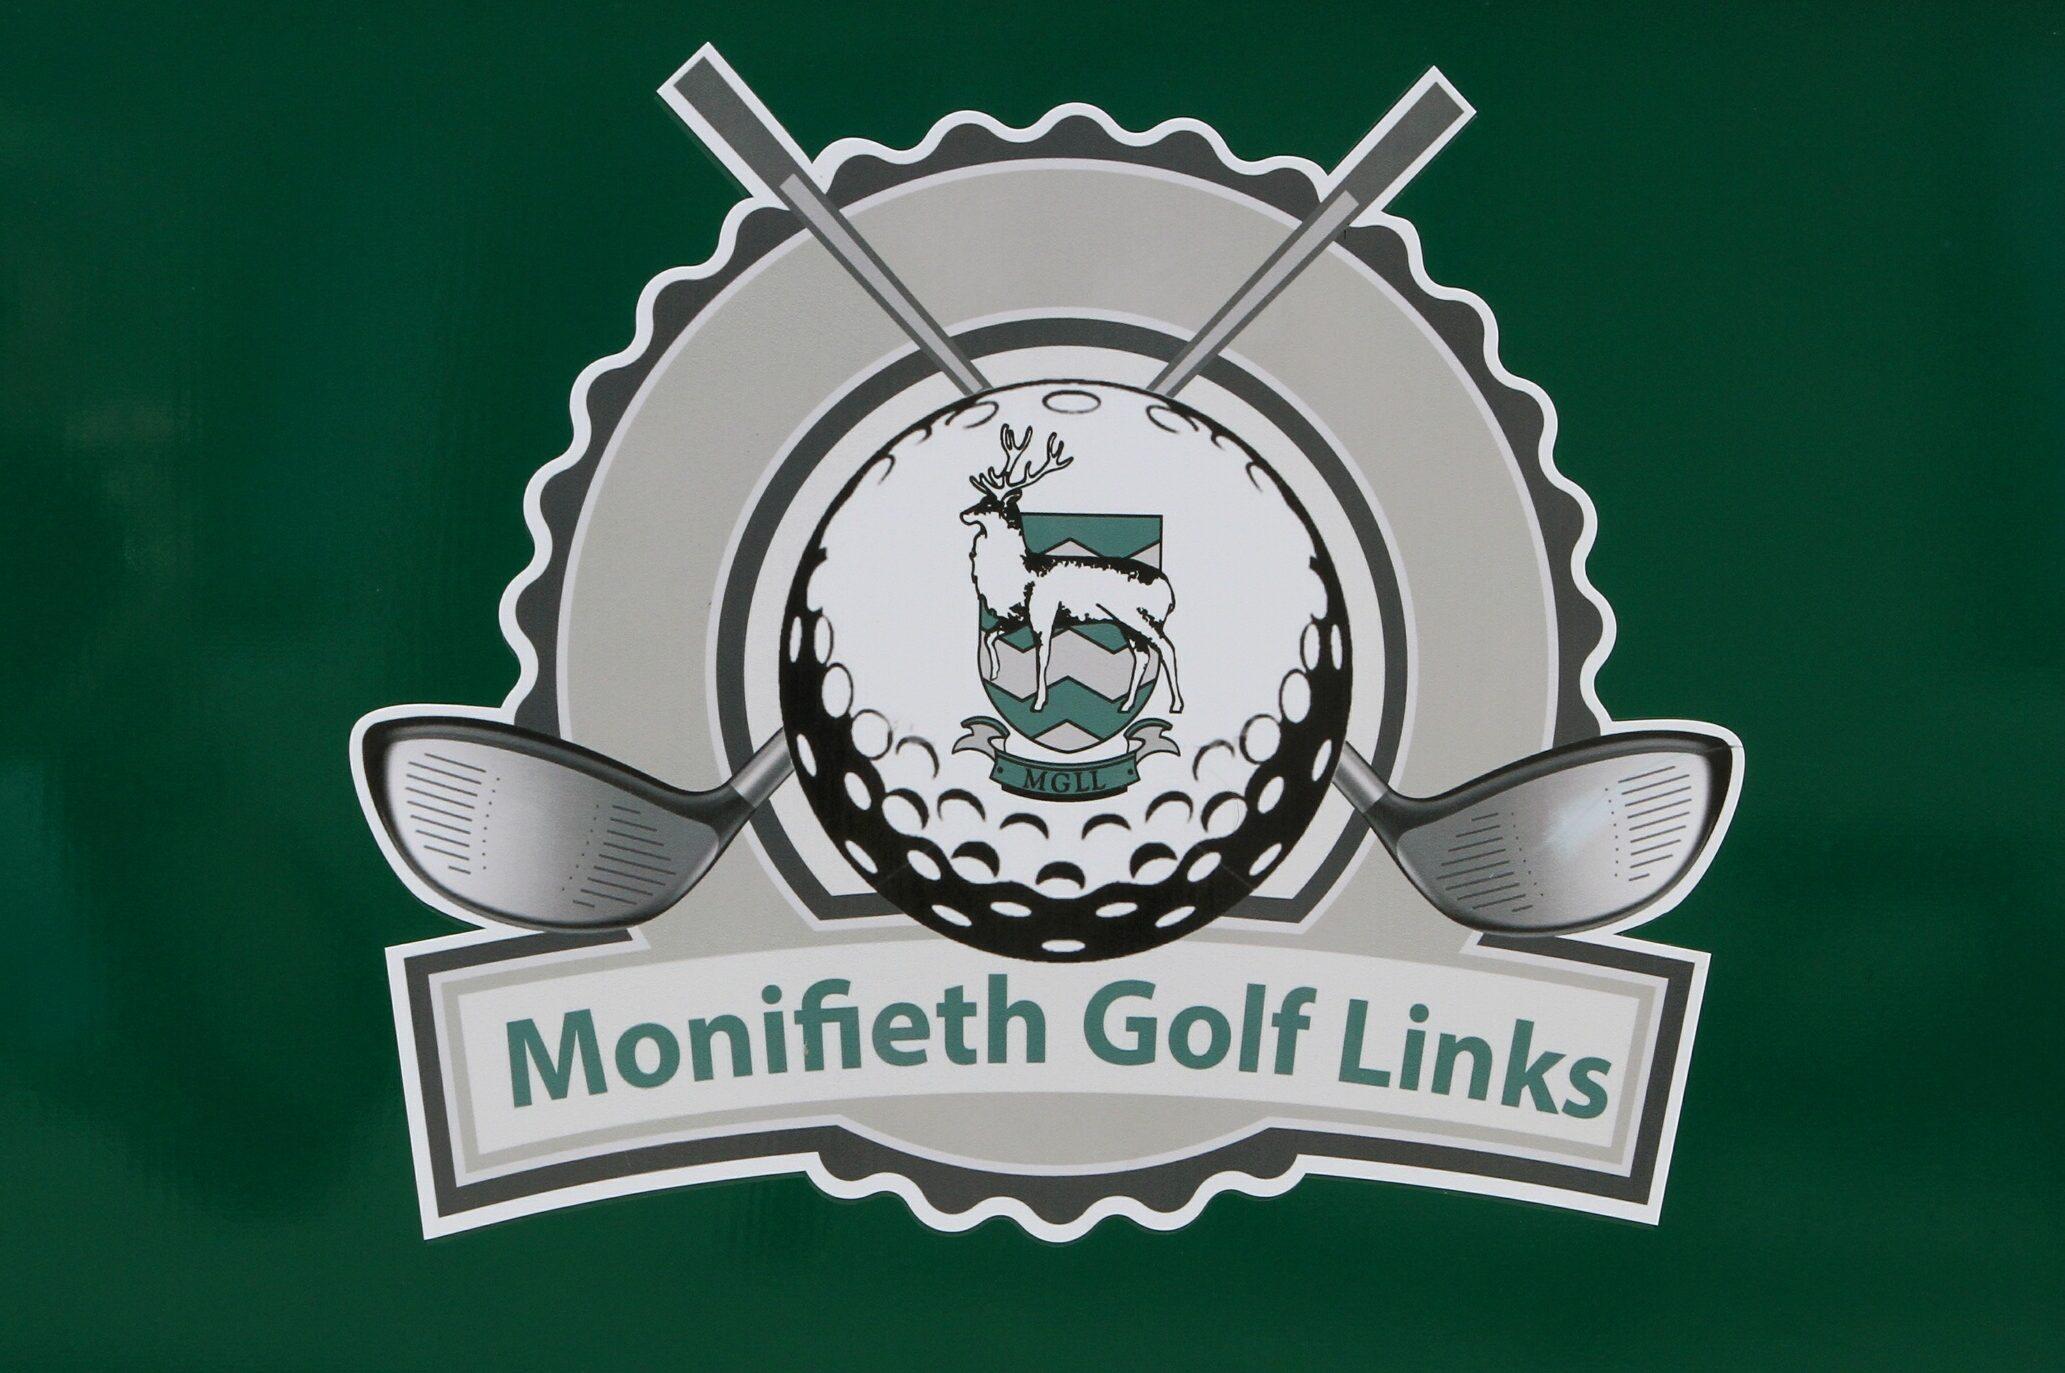 Monifieth Golf Links